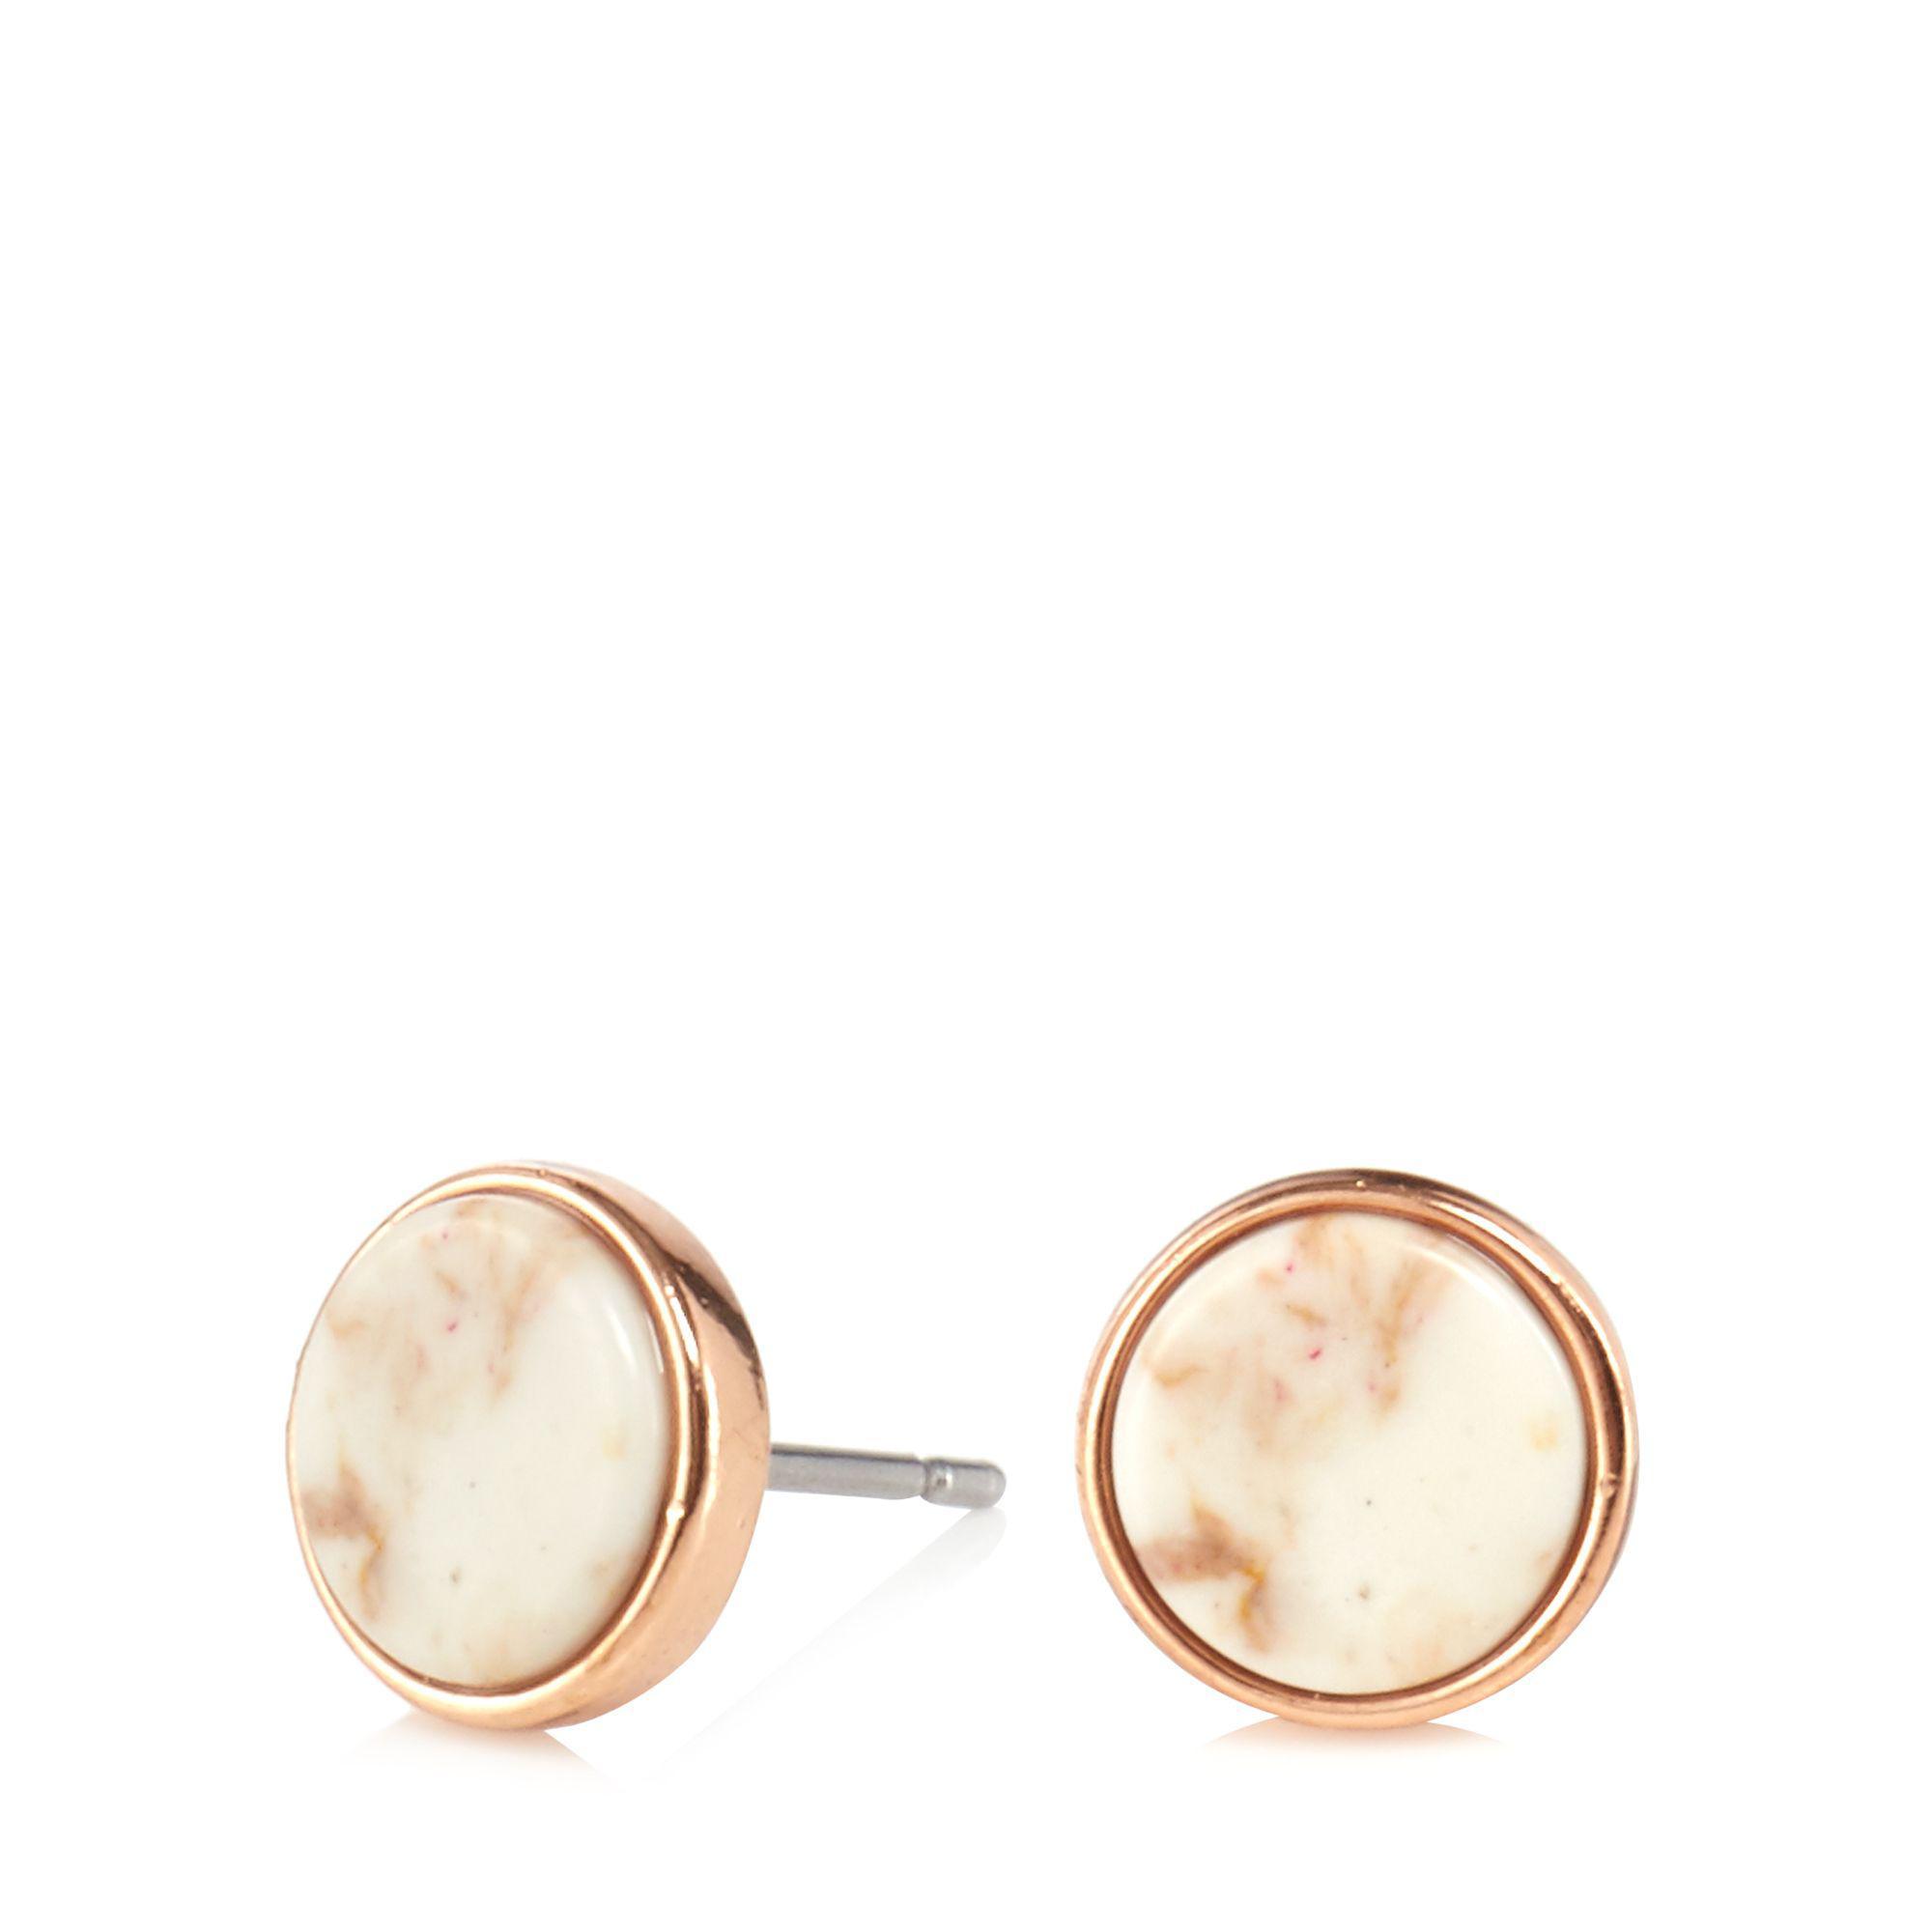 1995dd753 Pilgrim Nude 'mina' Rostone Stud Earrings in Natural - Lyst